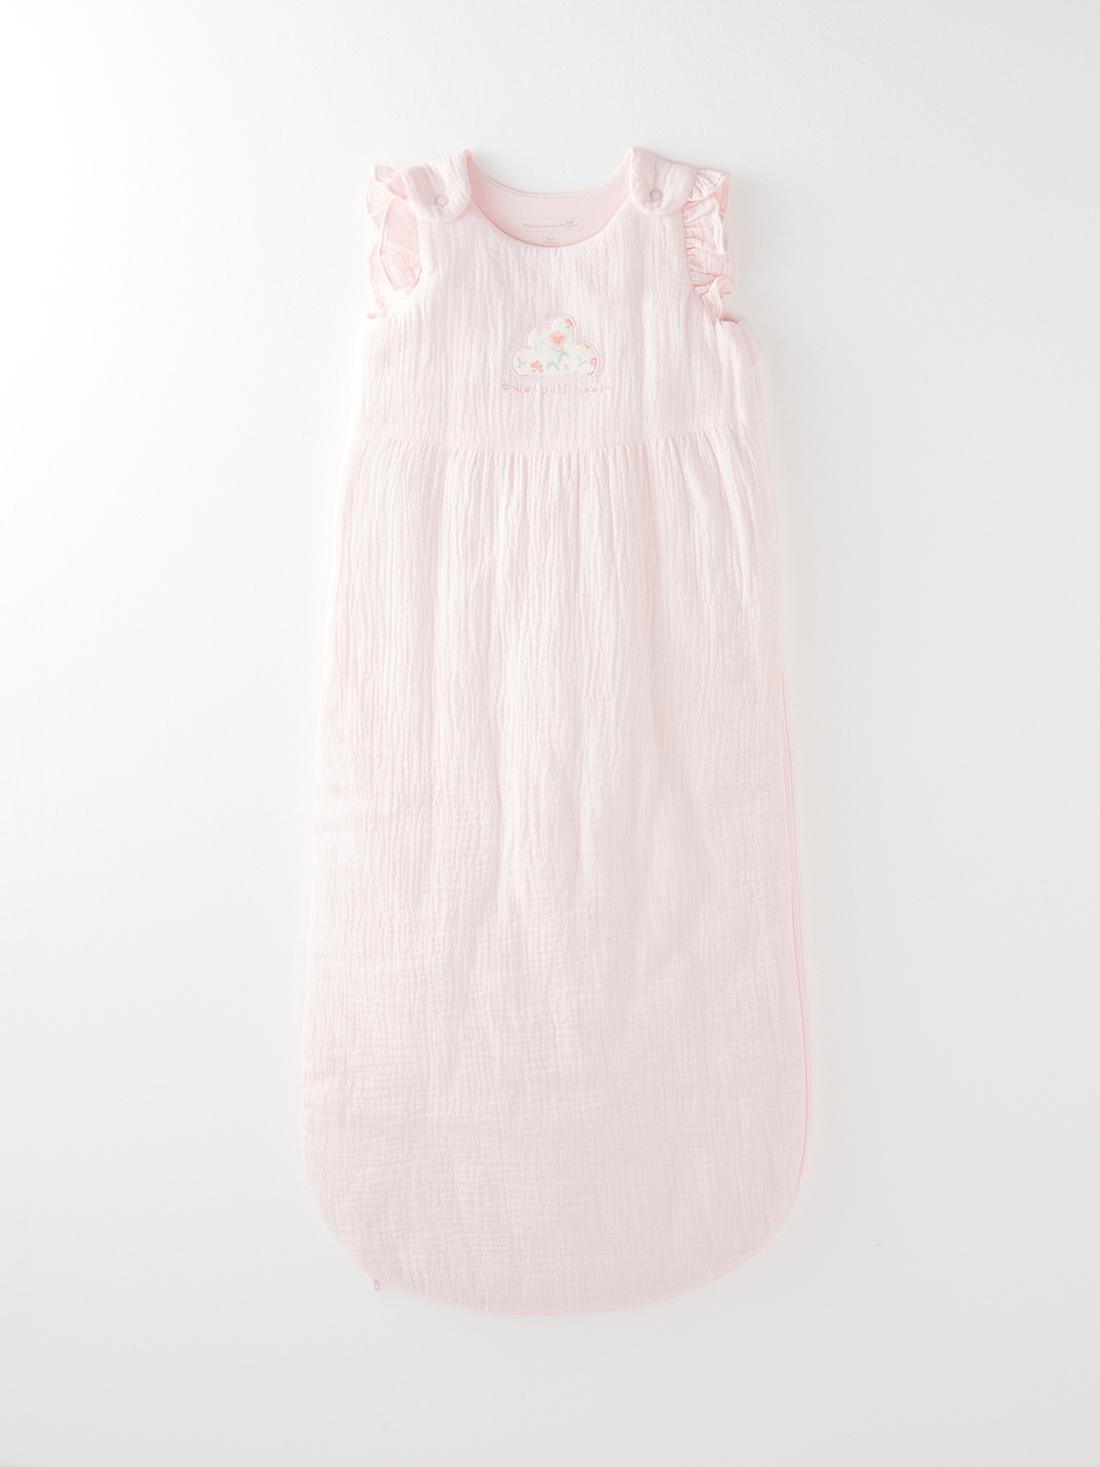 Turbulette rose bébé fille